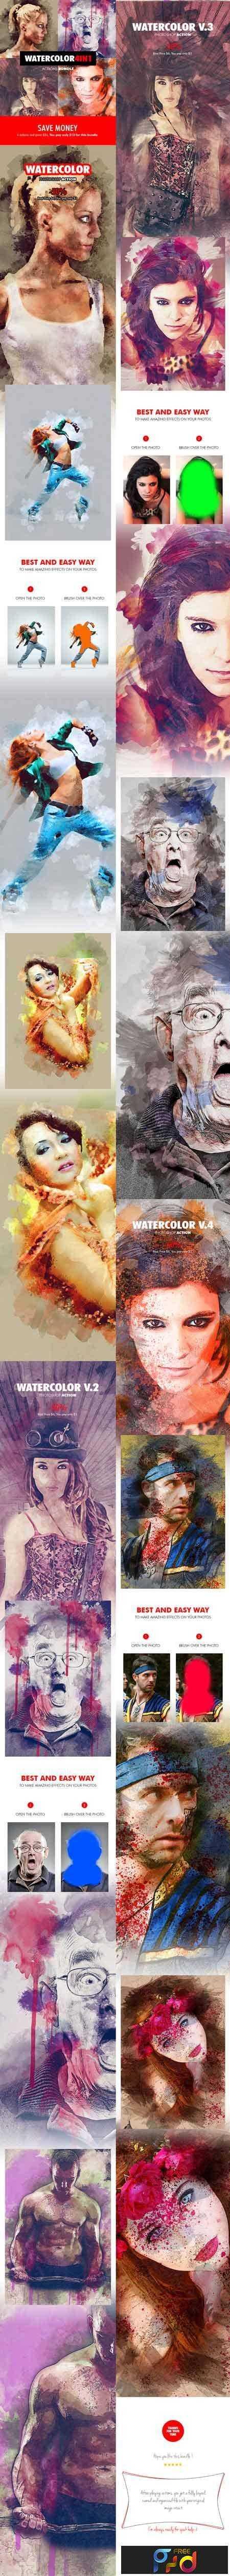 freepsdvn-com_1478578731_watercolor-4in1-photoshop-actions-bundle-v1-18180095